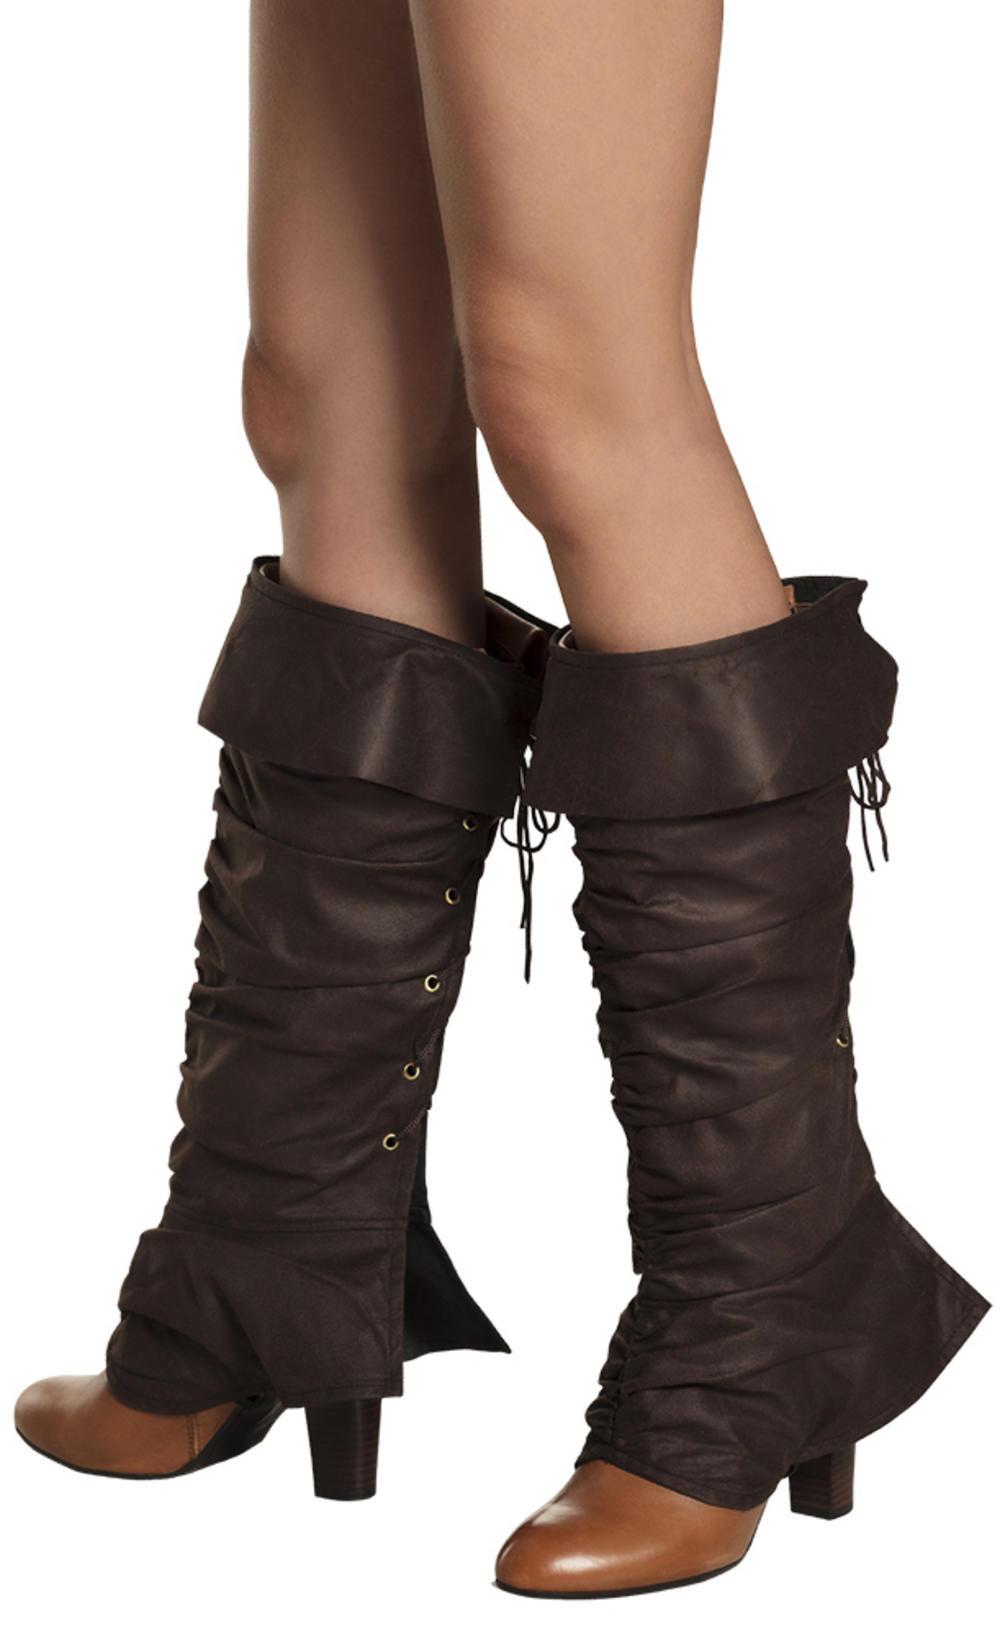 Huntress Boot Top Ladies Costume Accessory